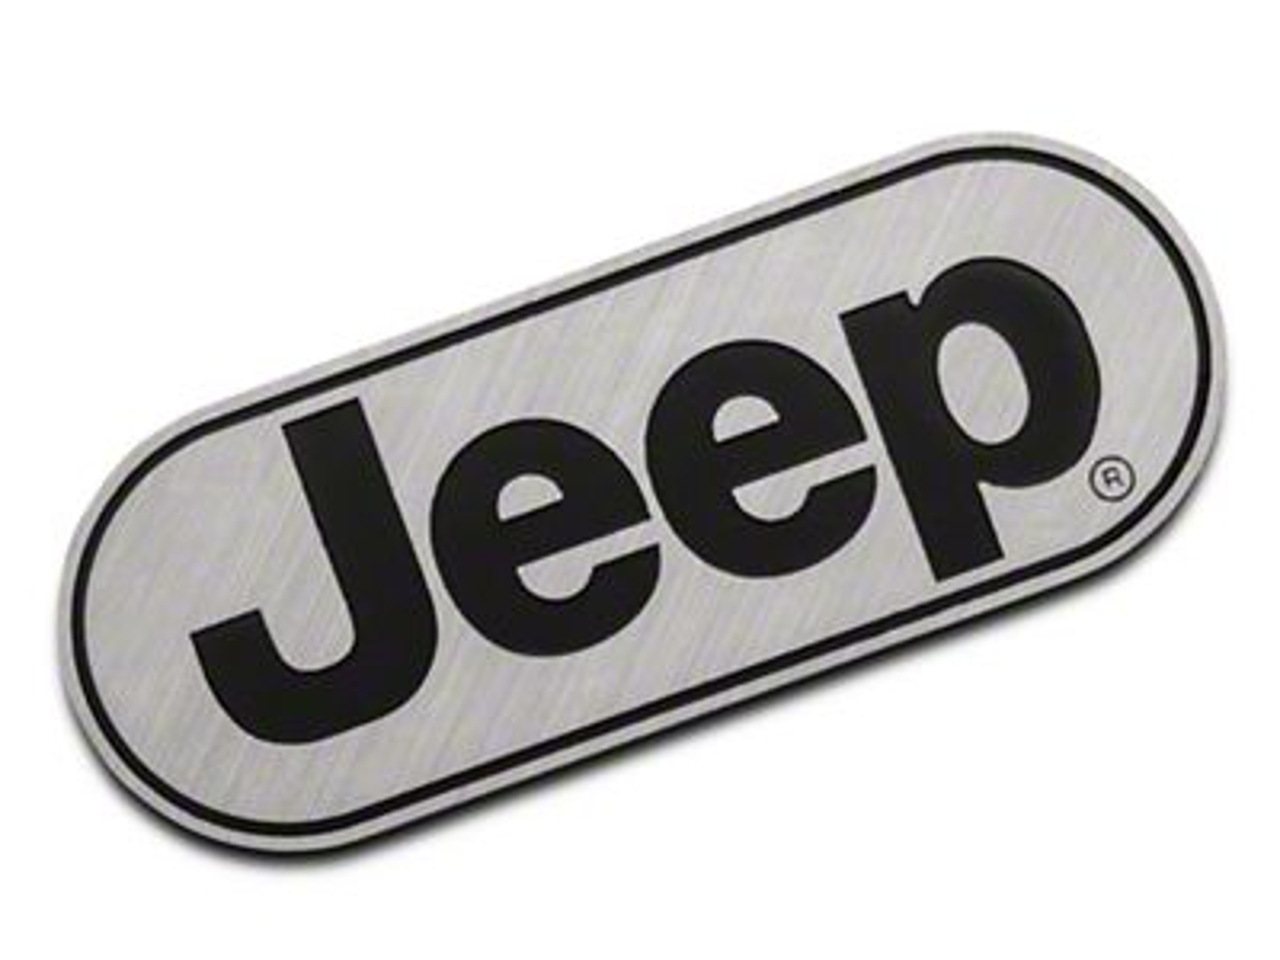 RedRock 4x4 Jeep Logo Hitch Cover (87-19 Jeep Wrangler YJ, TJ, JK & JL)